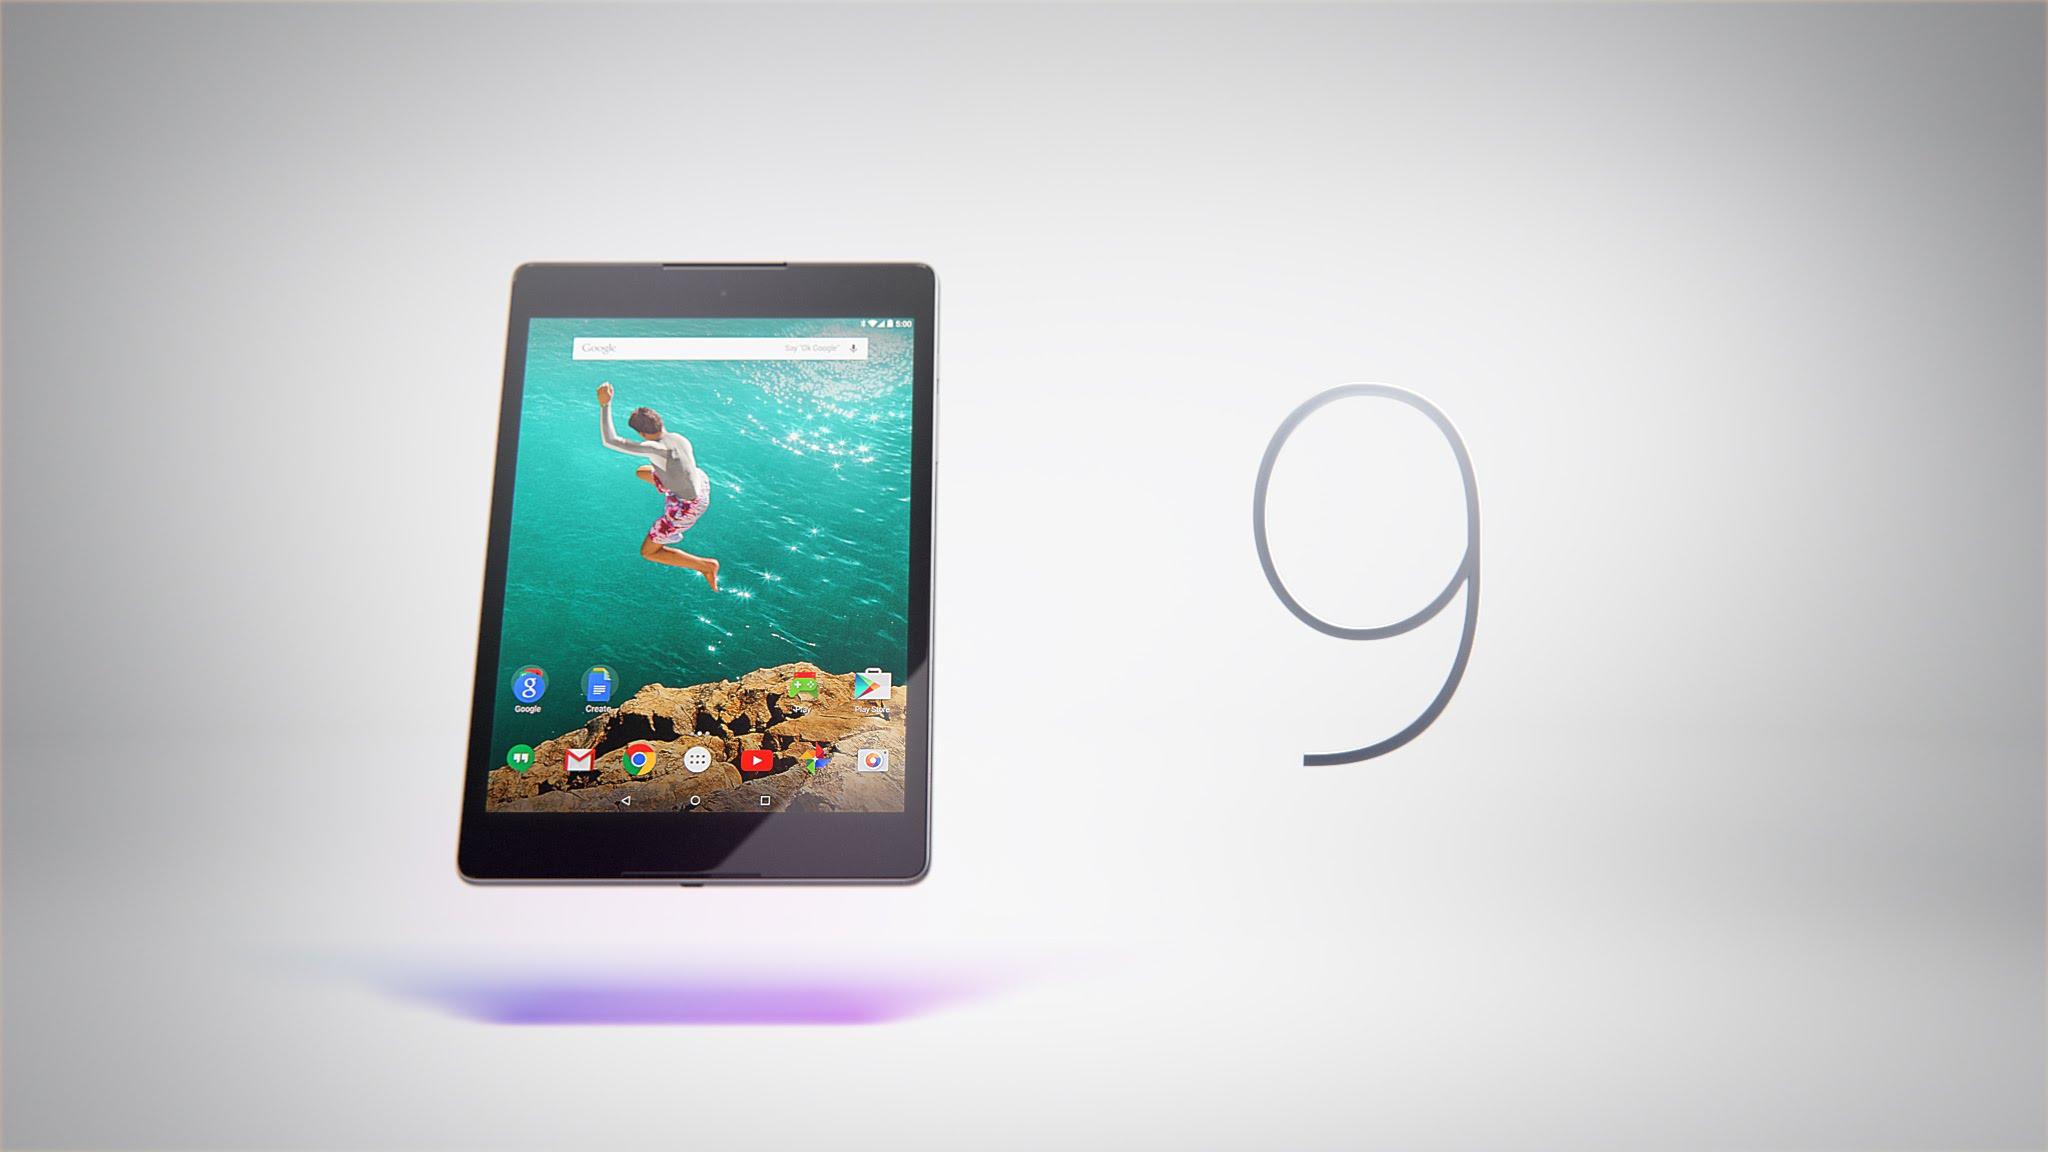 Android 5.0 Lollipop, Nexus 6, Nexus 9 and Nexus Player | Duape